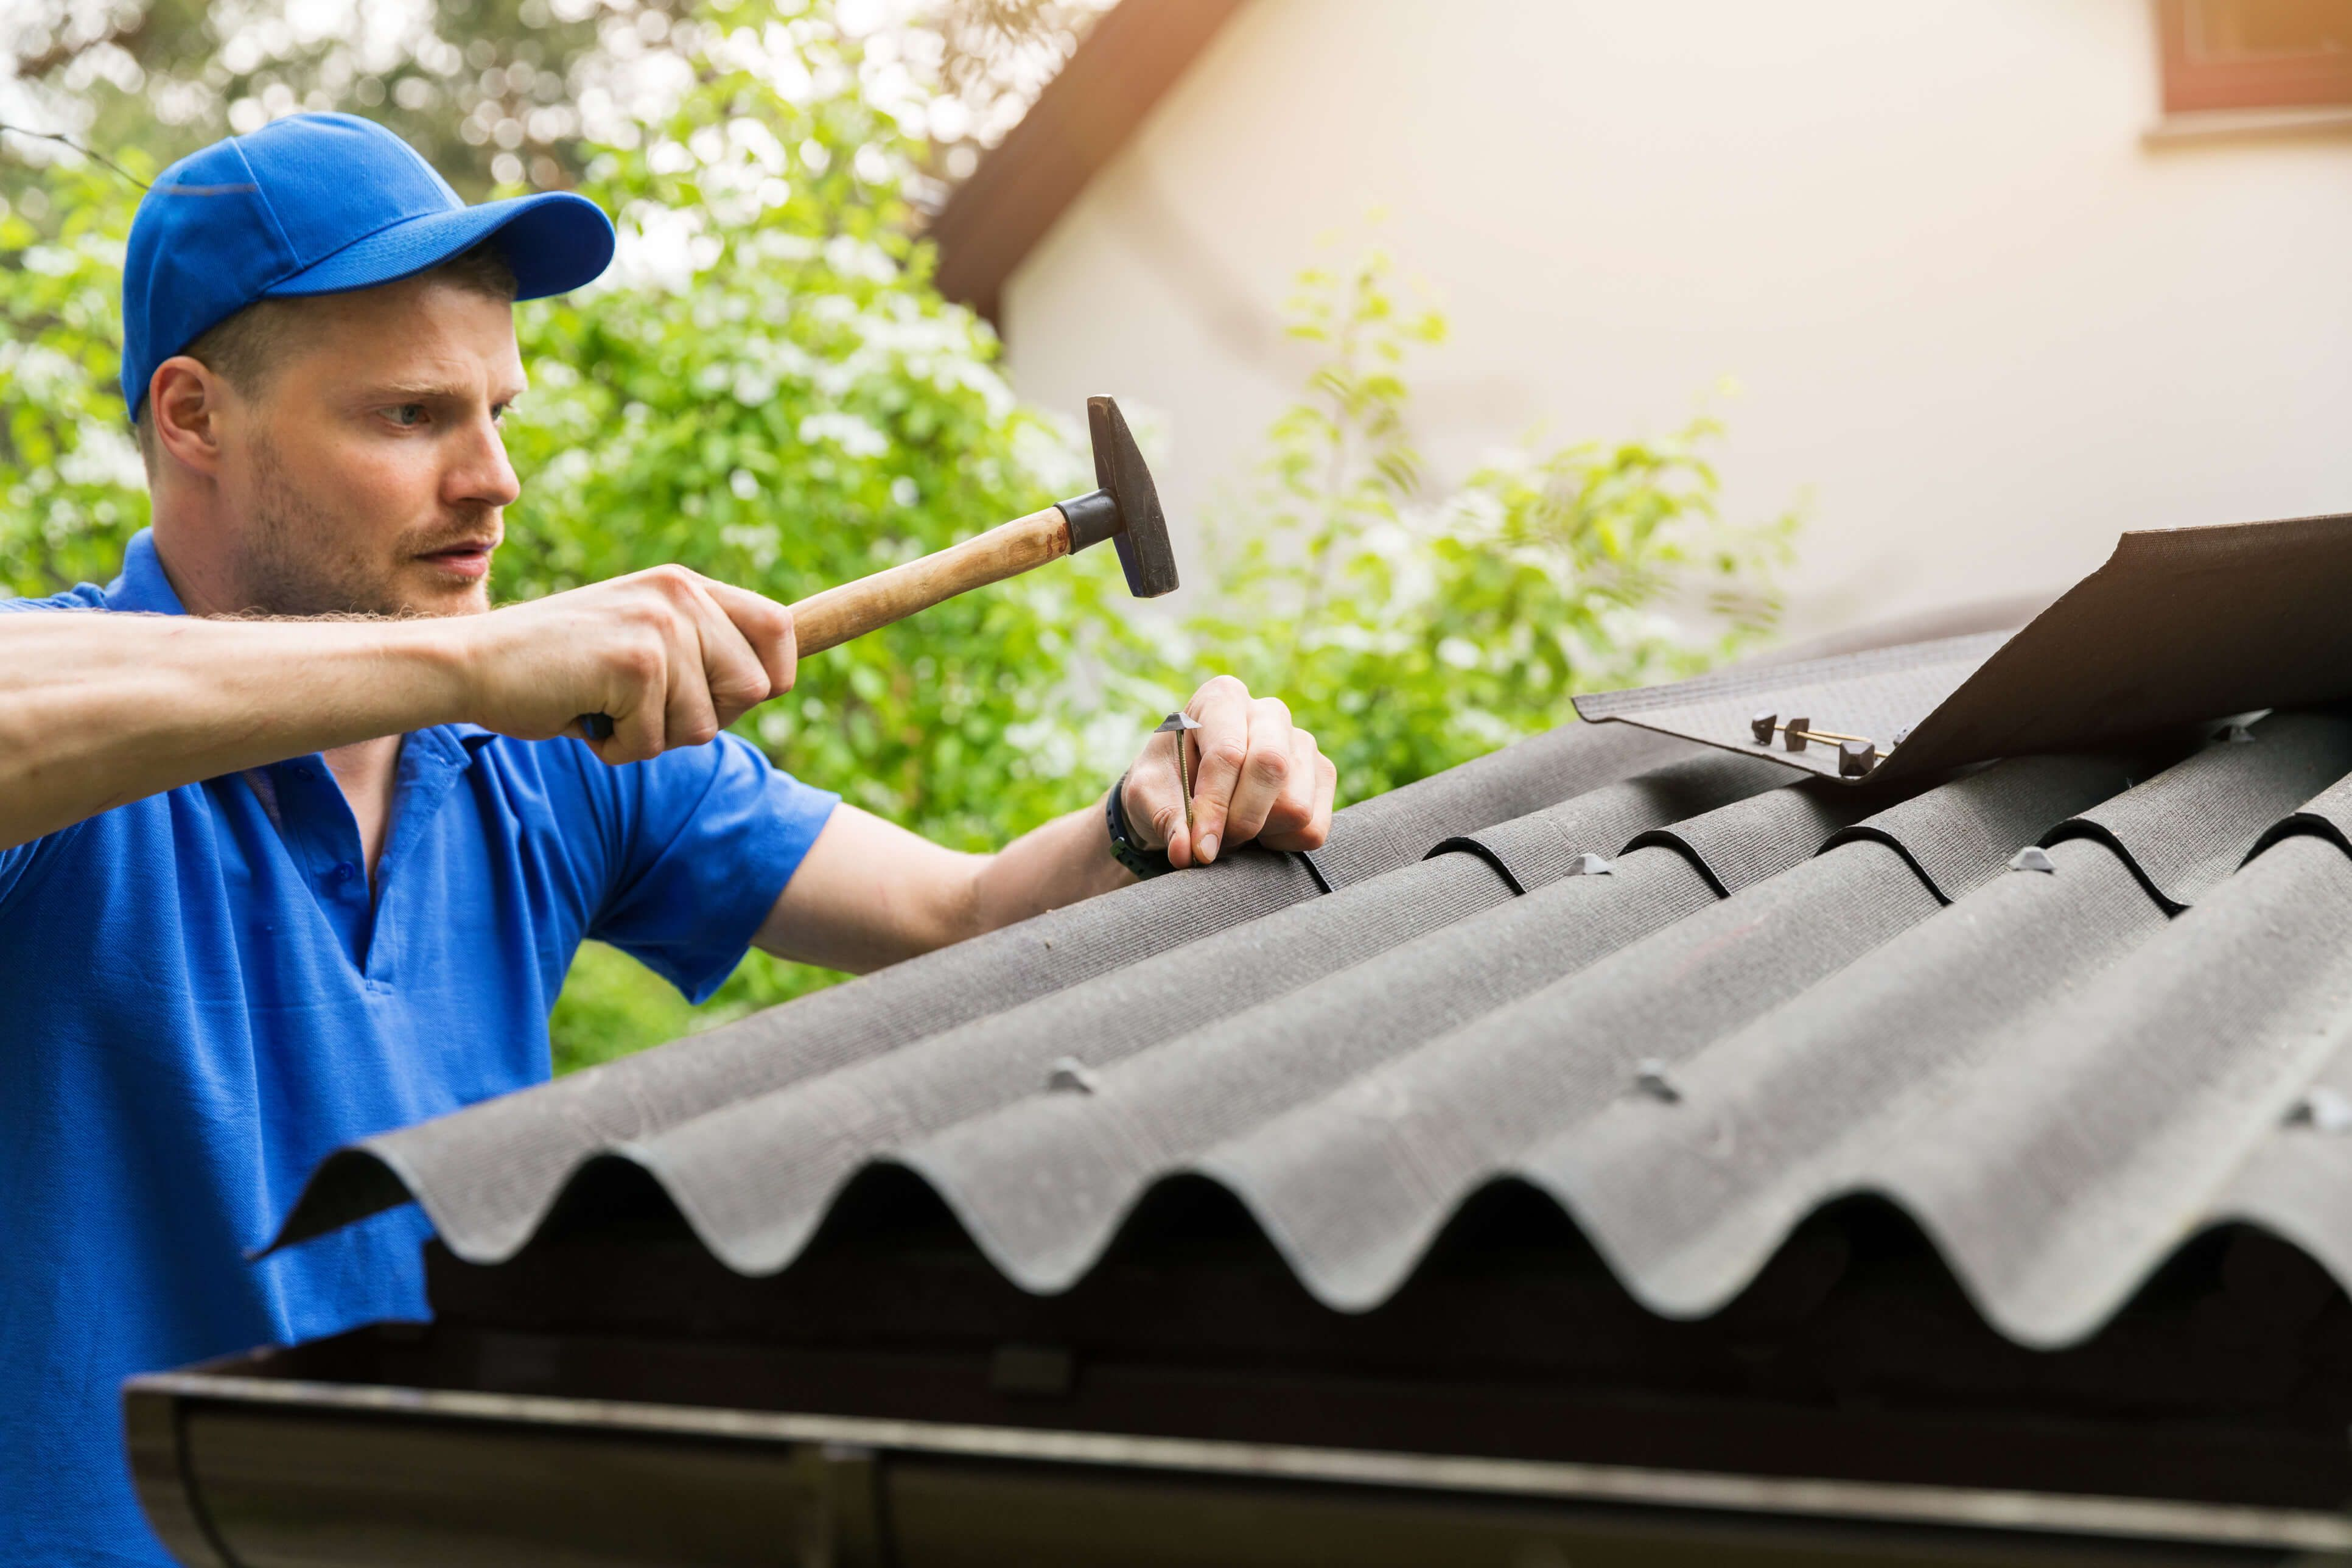 Storm Hail Roof Damage Repair Service Peachtree City GA | Roof repair,  Metal roof repair, Cool roof